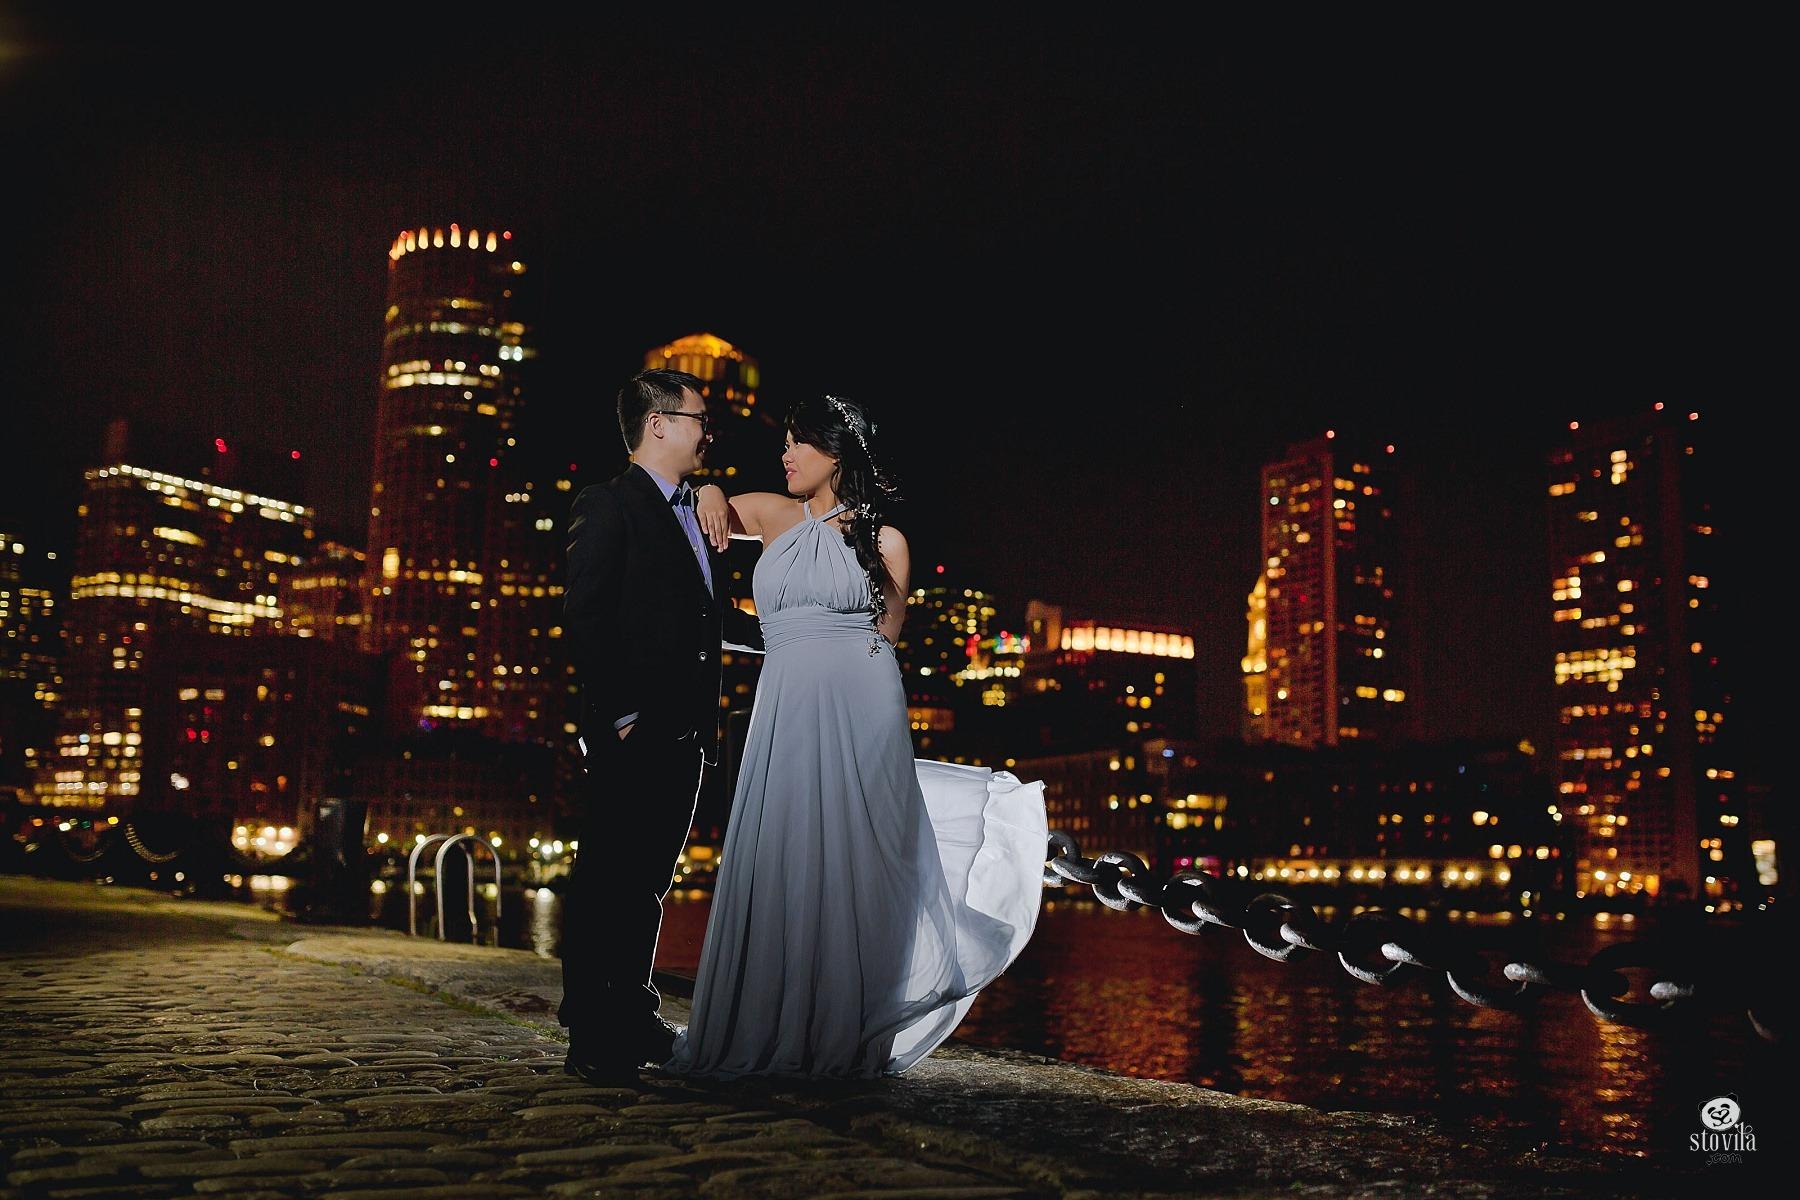 Mike & Em Engagement Session, Boston Public Garden, Fan Pier, Charles River   Boston & NH Wedding Photographers - STOVILA // Modern Professional Affordable 10